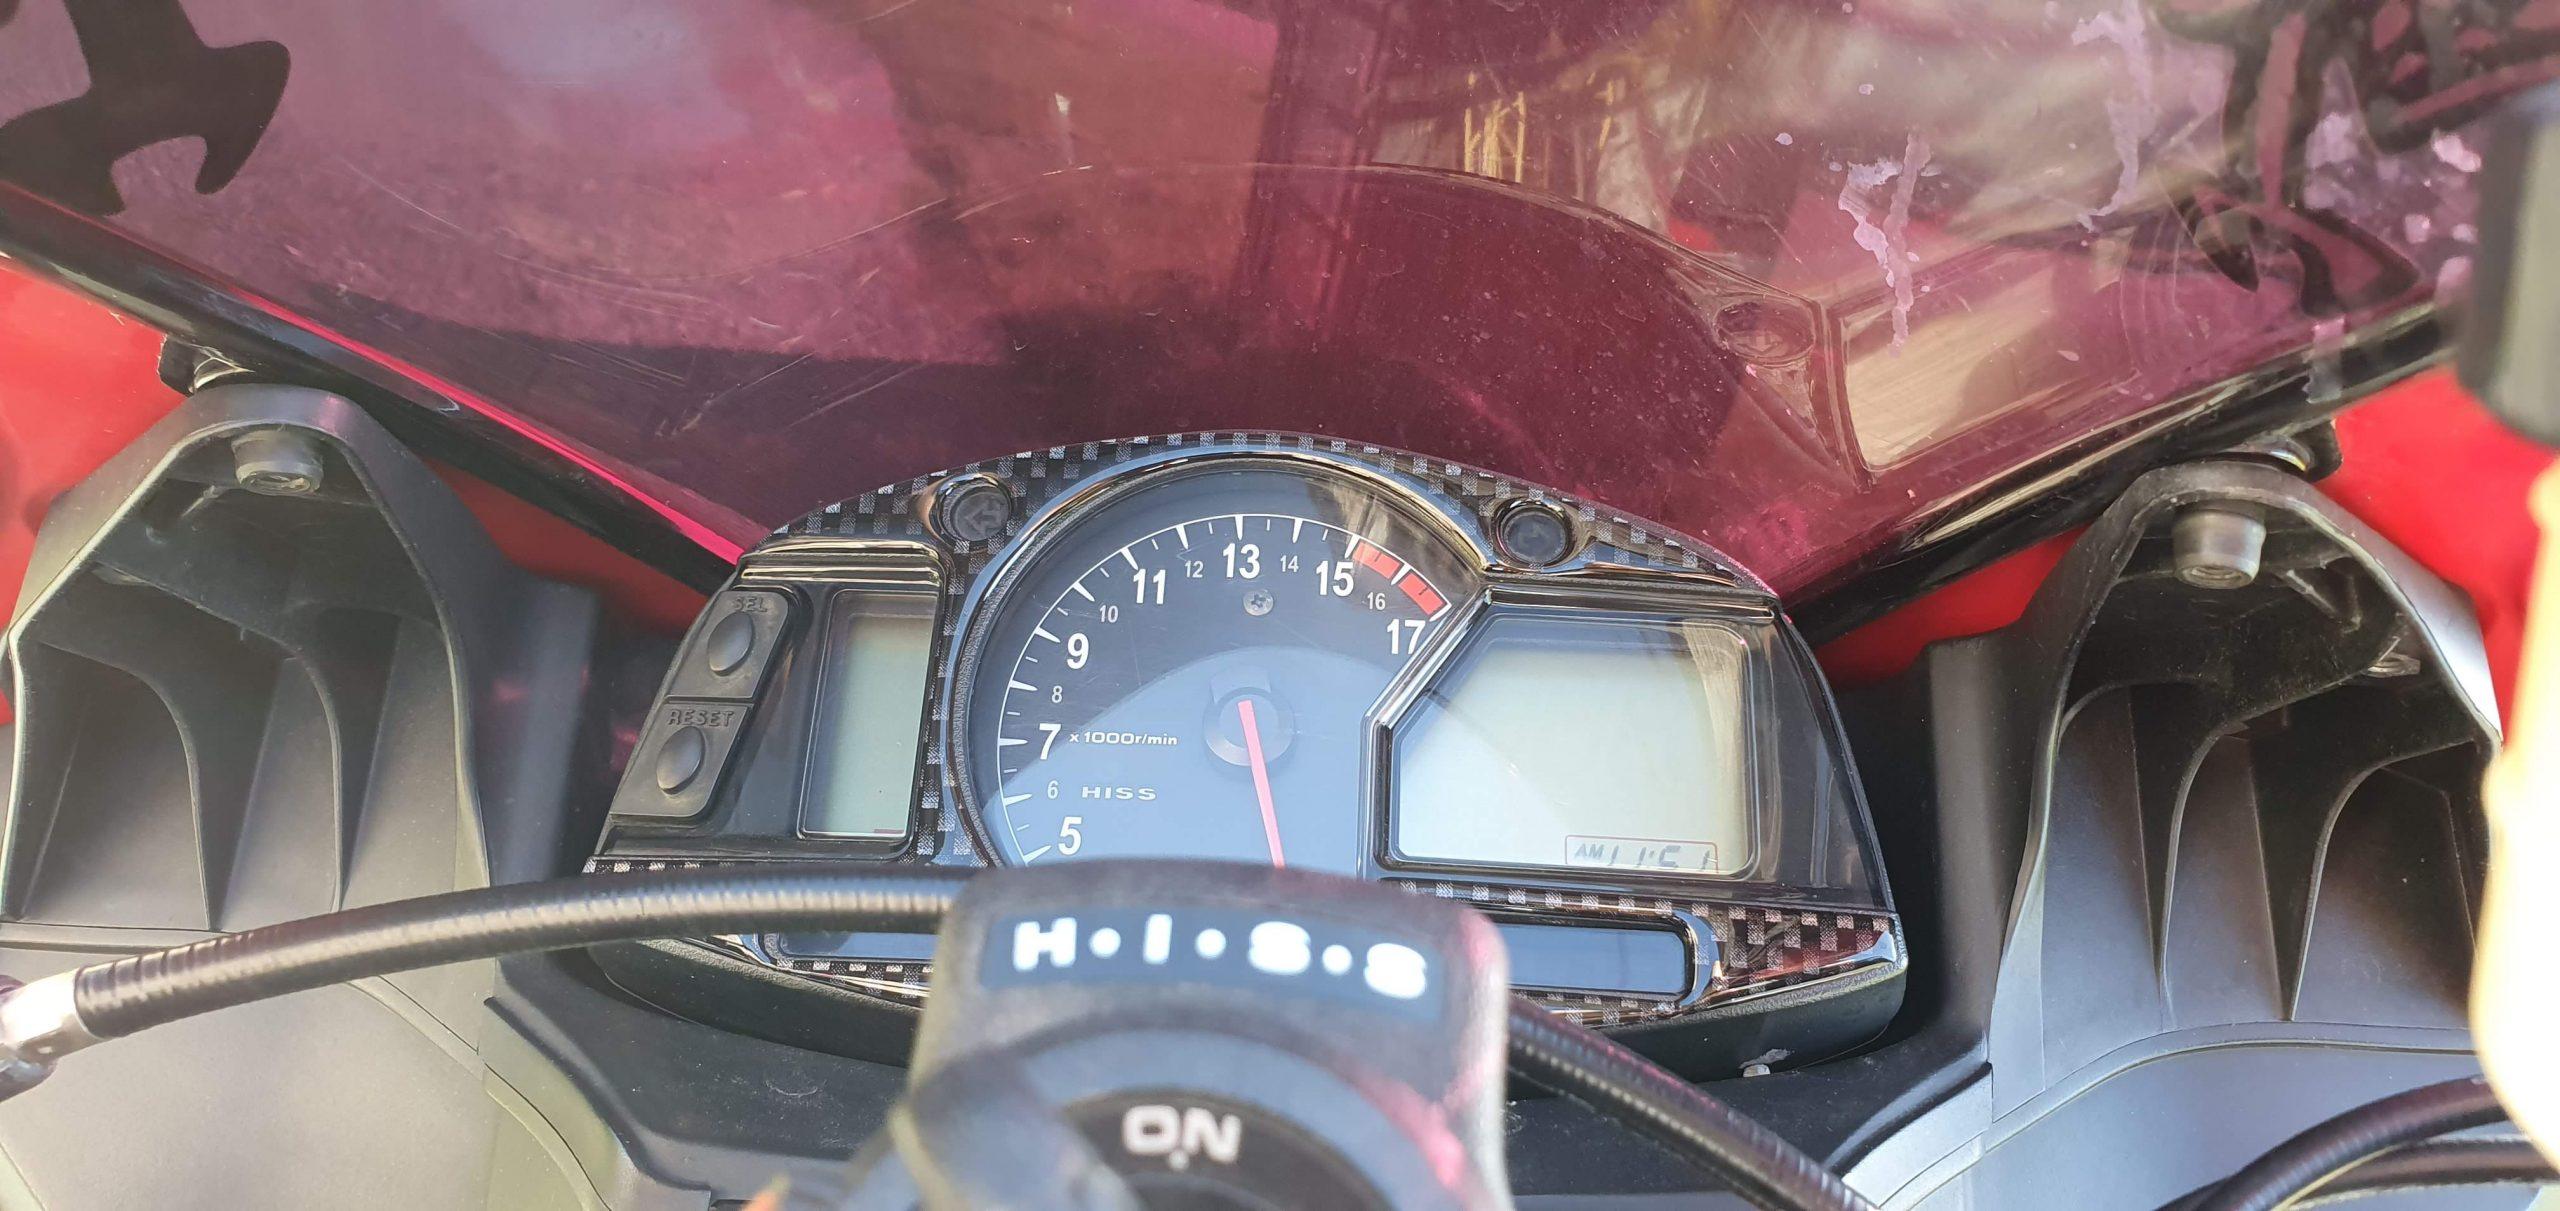 2008 Honda CBR 600 RR Review Carbon Cluster